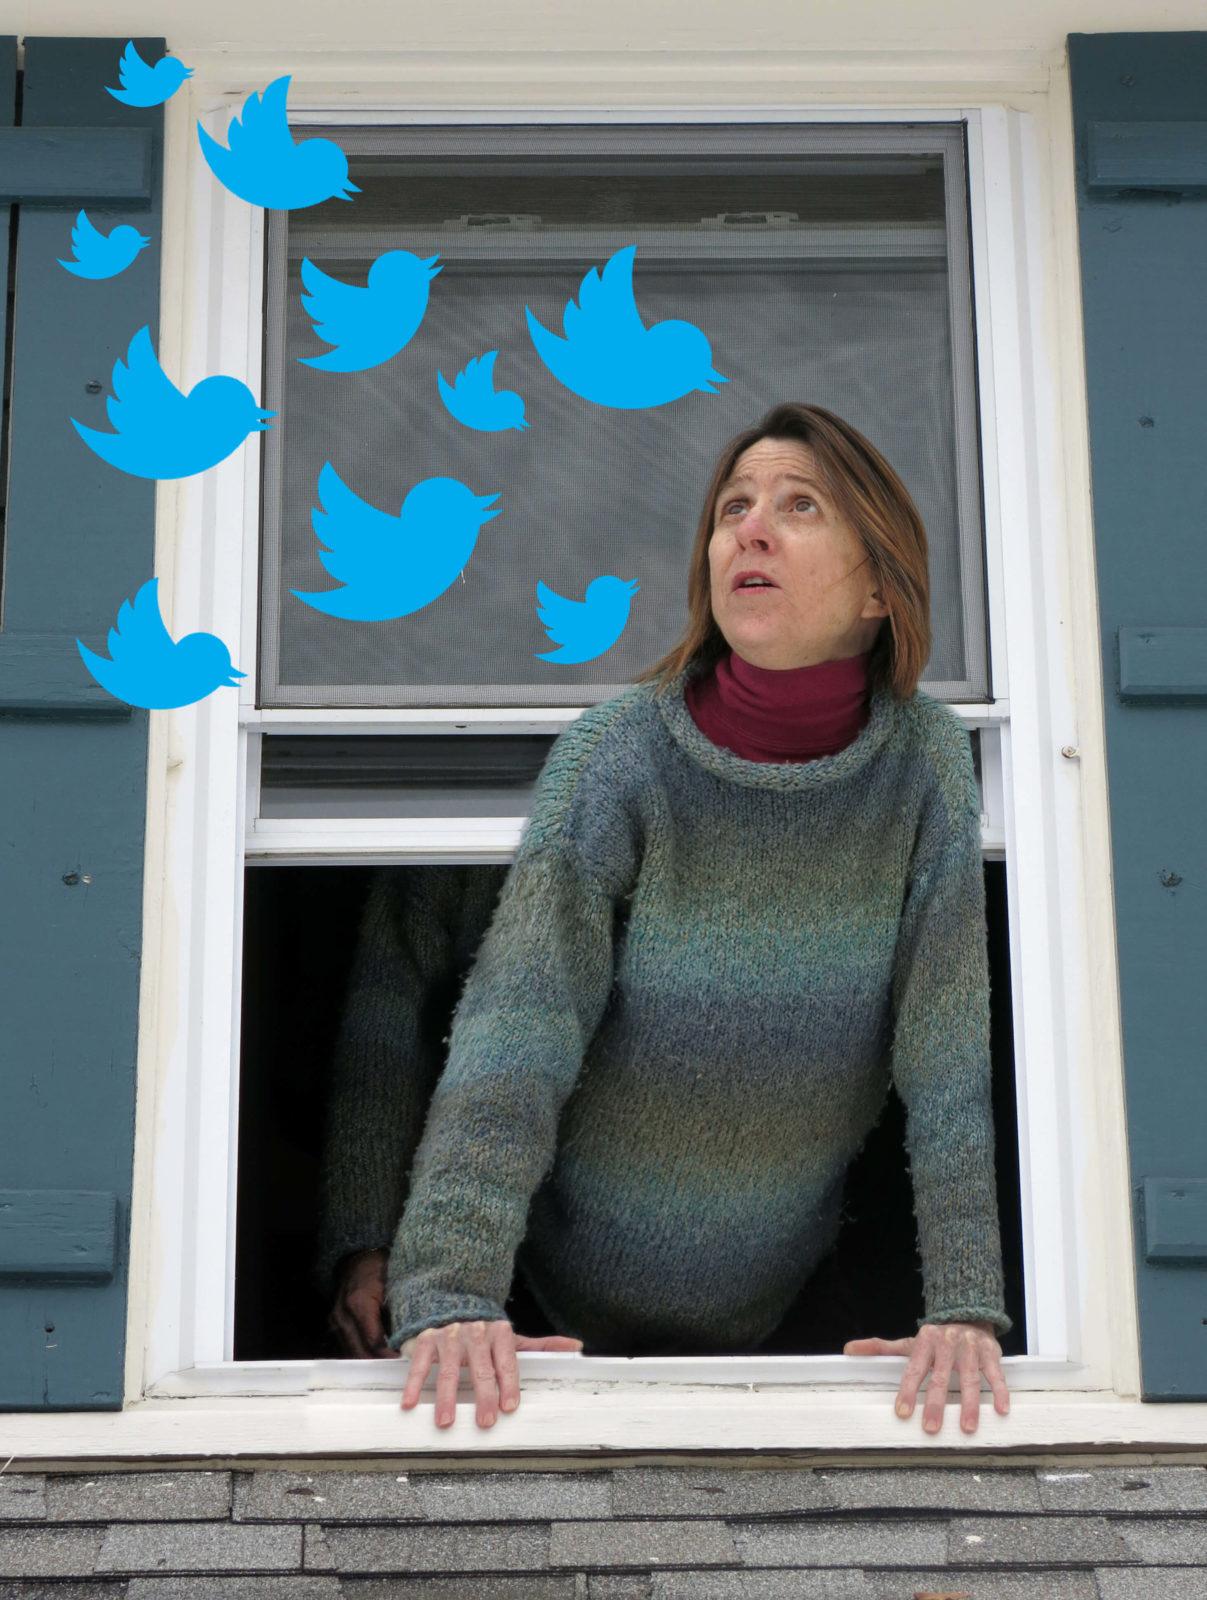 friend of Robin Botie in Ithaca, New York, calls out her window to blue twittwer birds